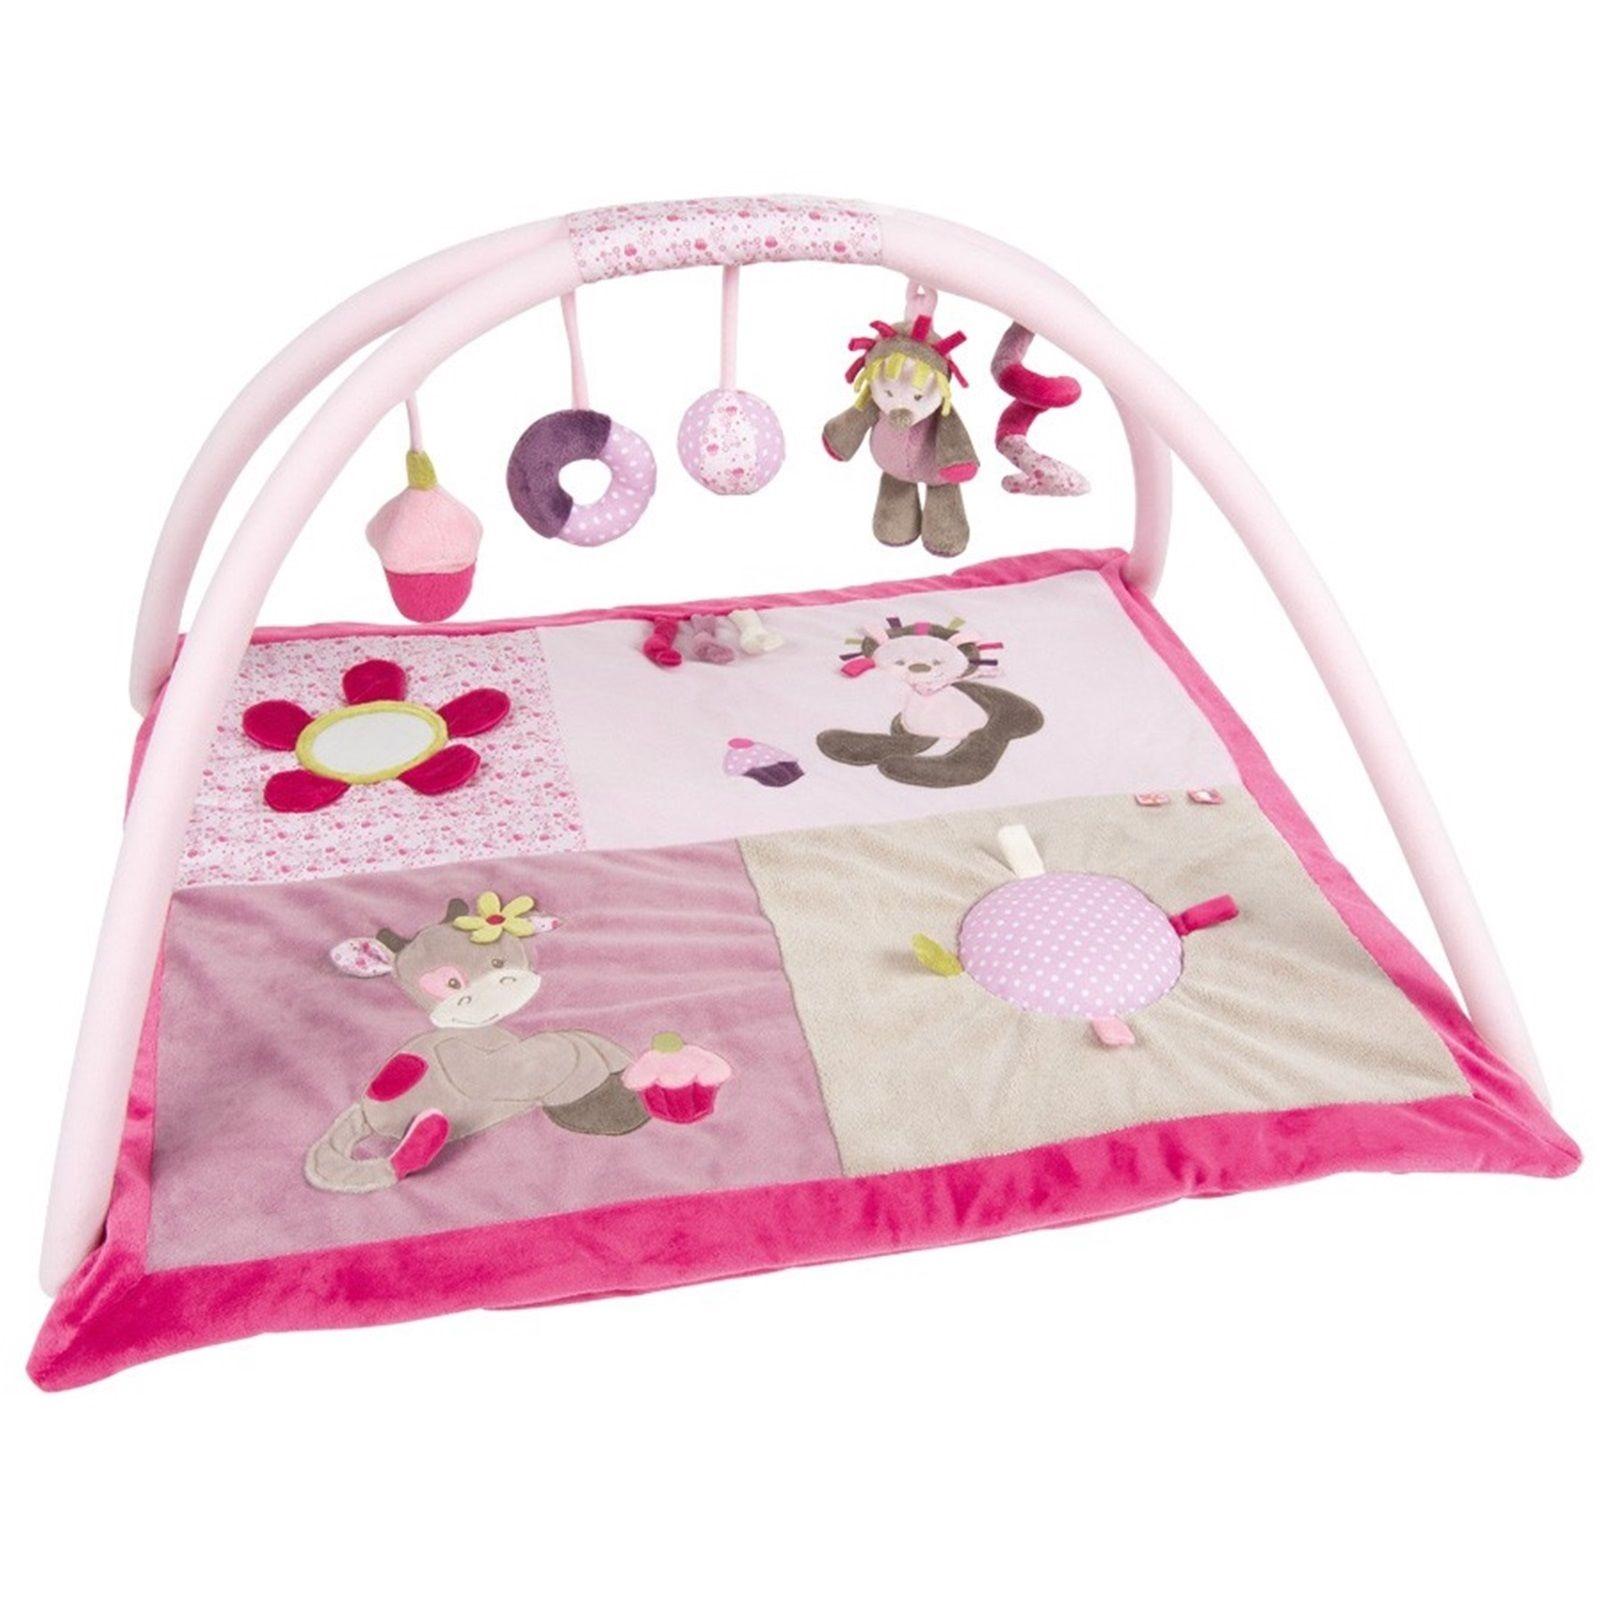 eerlebnisdecke krabbeldecke spieldecke babydecke spielzeugdecke mobile ebay. Black Bedroom Furniture Sets. Home Design Ideas